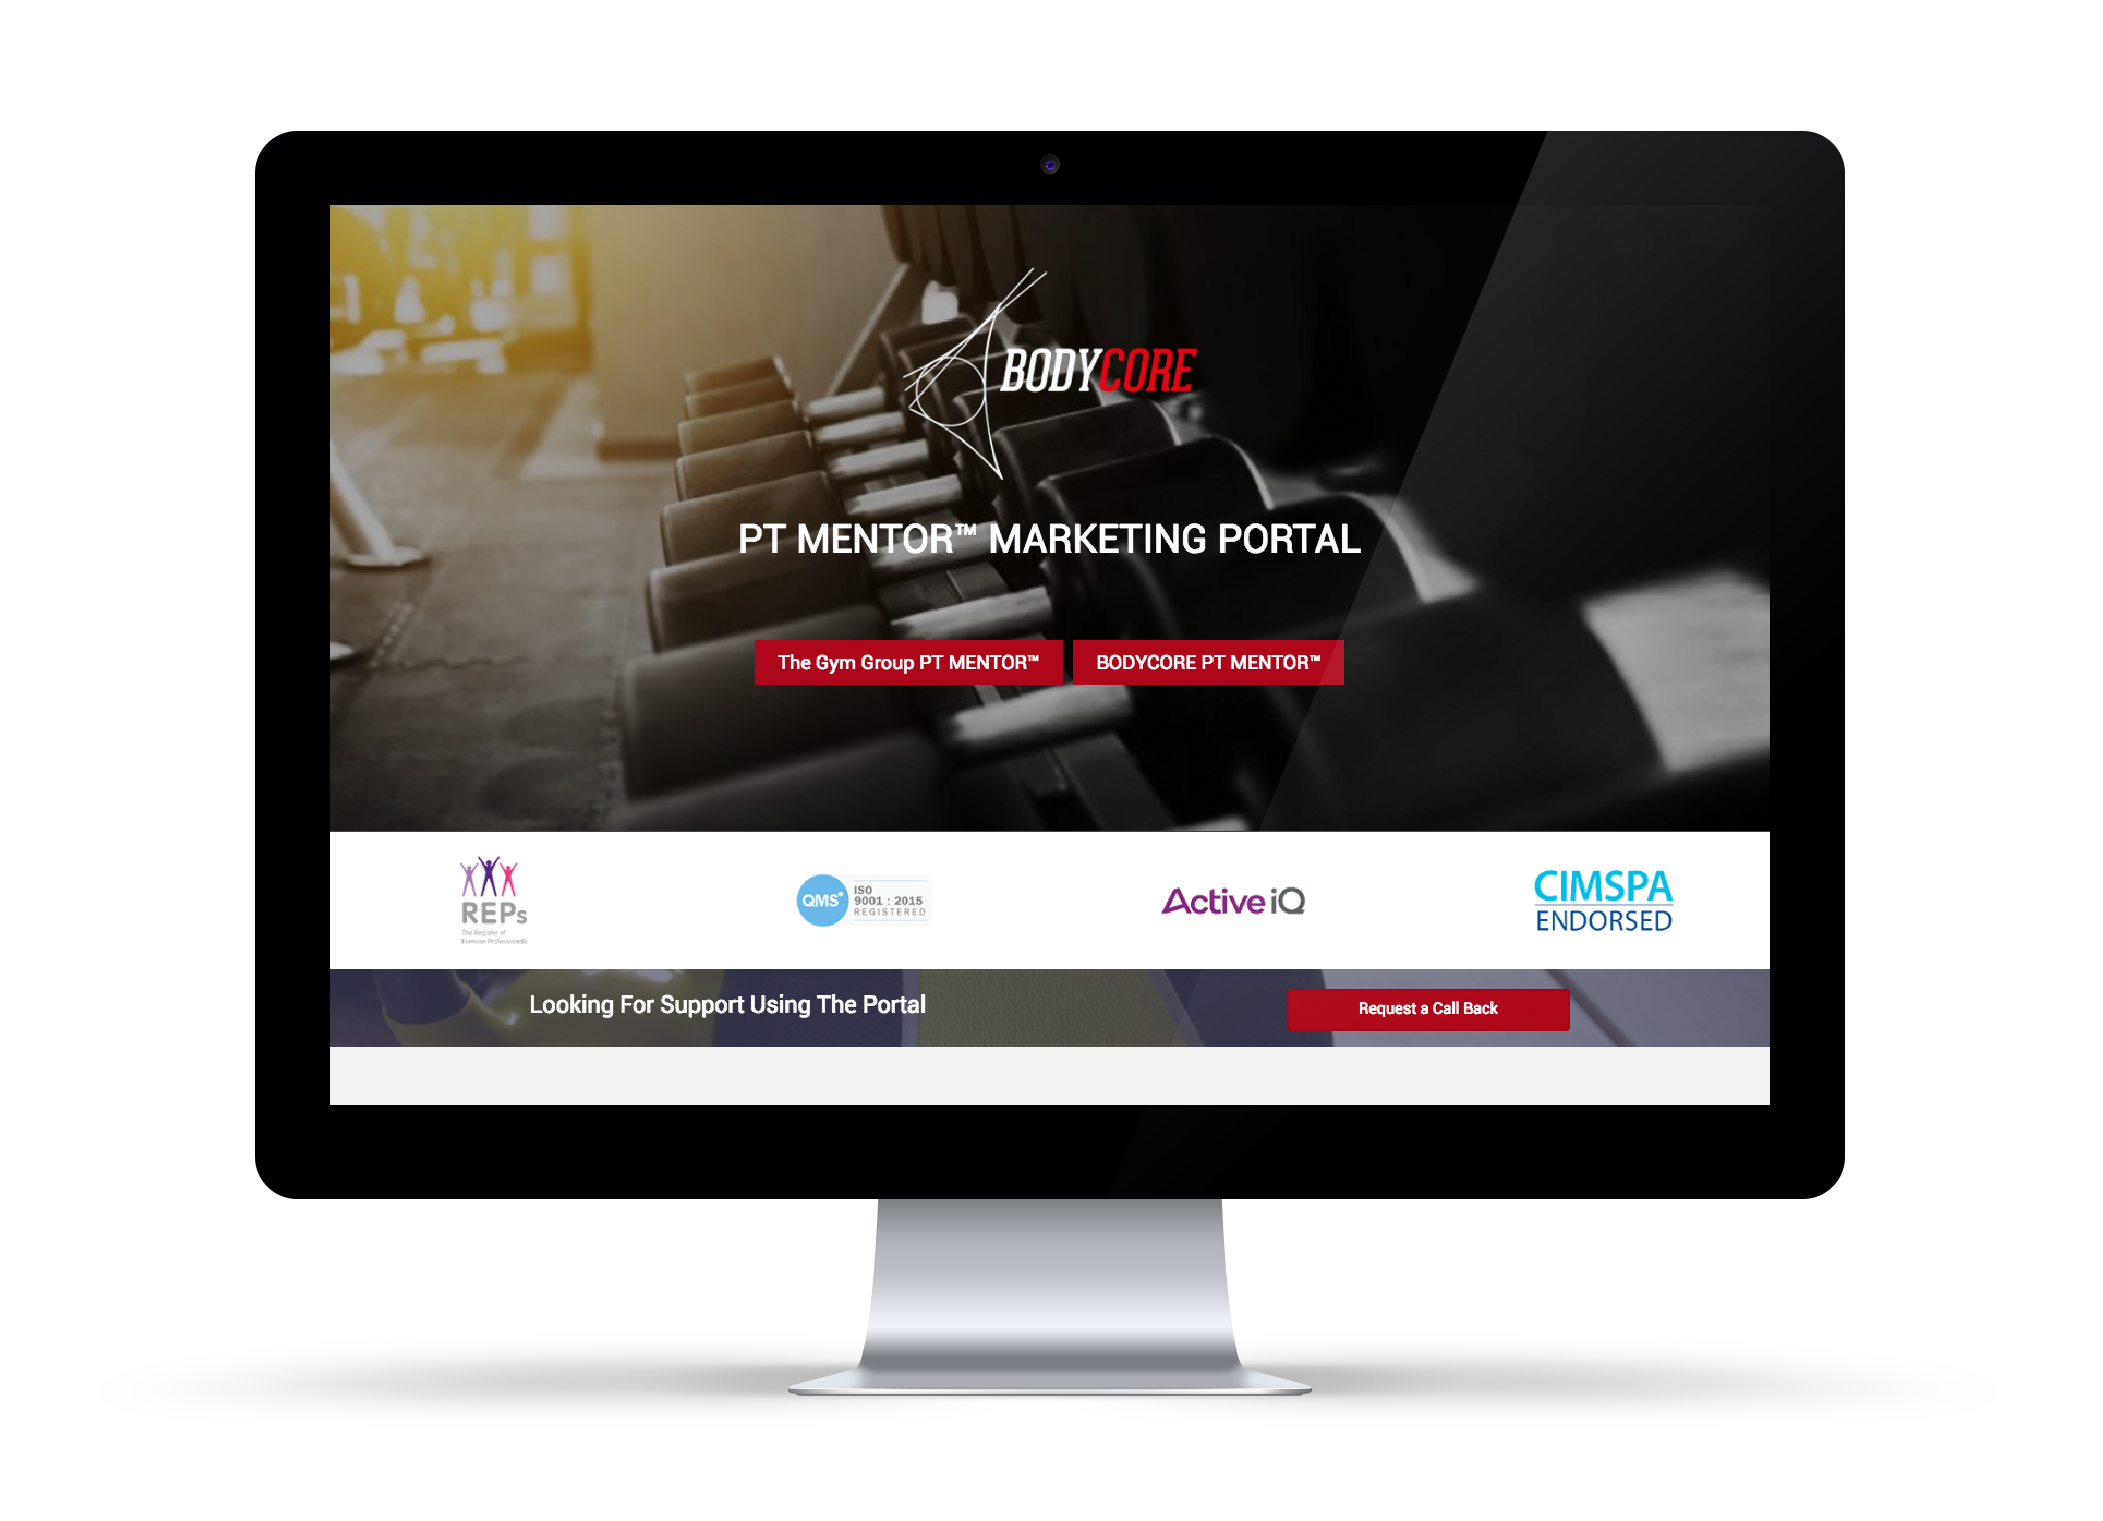 BODYCORE Marketing Portal